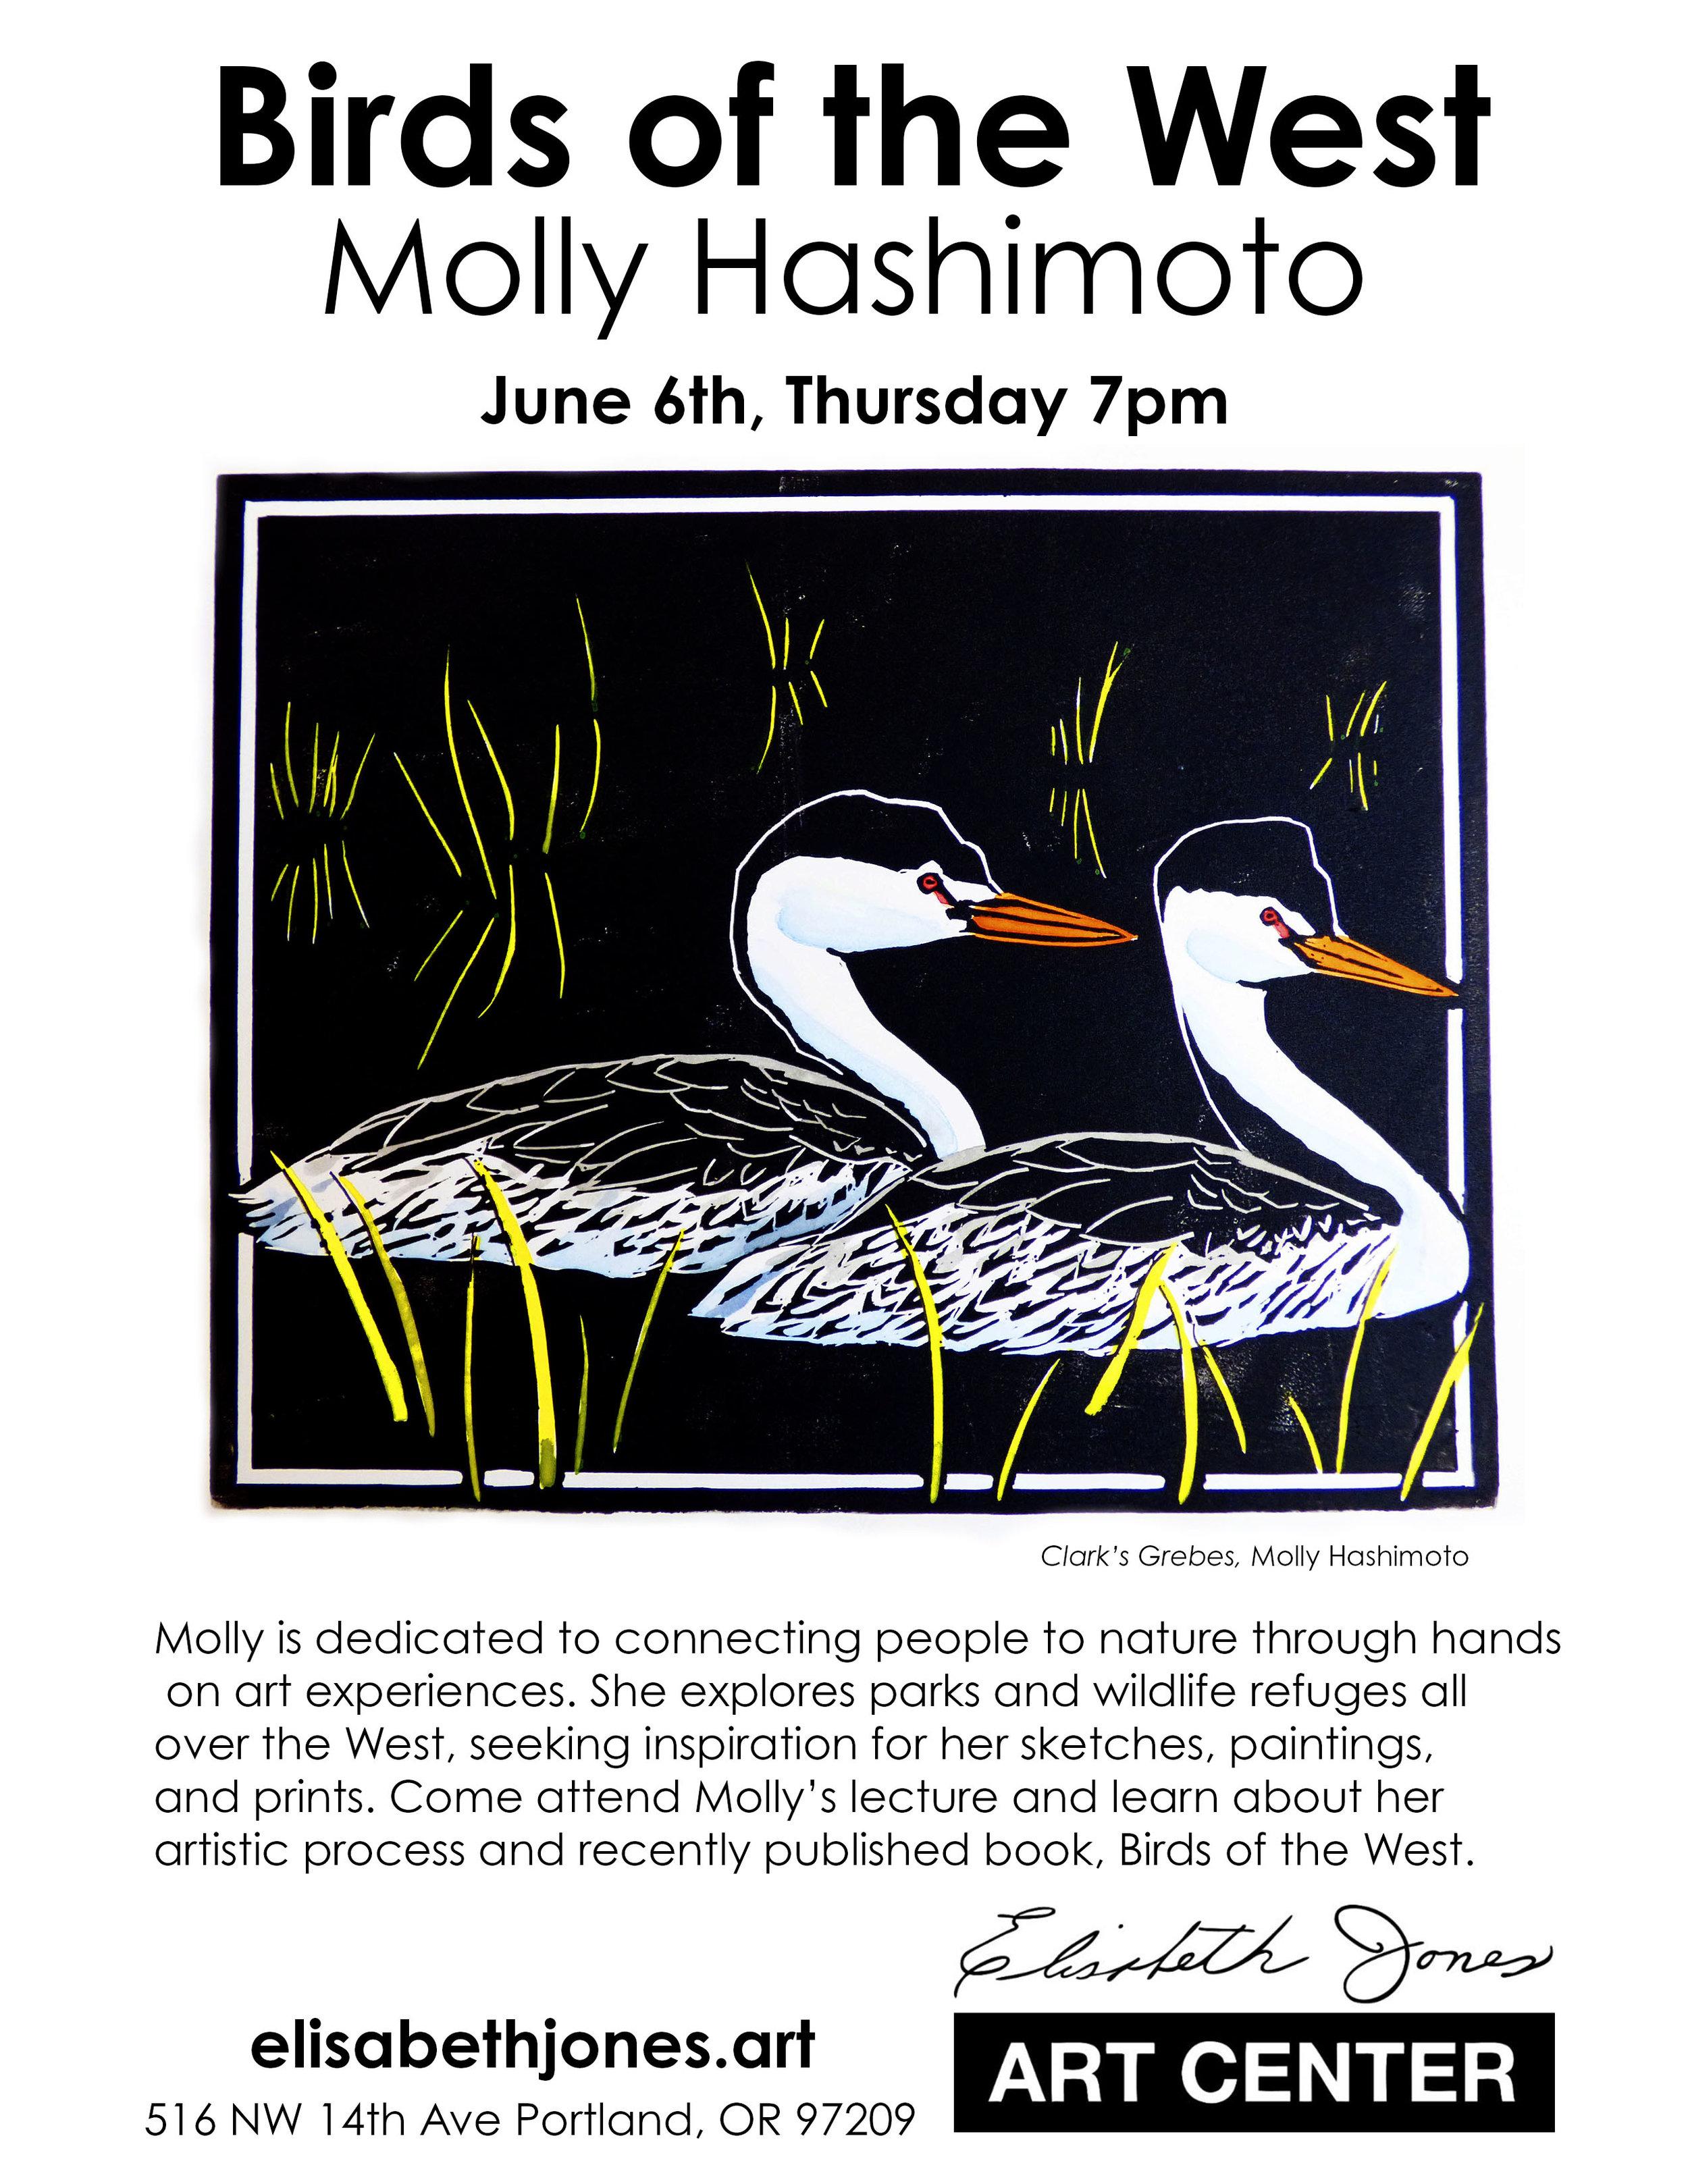 Molly Hashimoto poster 8.5x11 (1) Elisabeth Jones Art Center.jpg